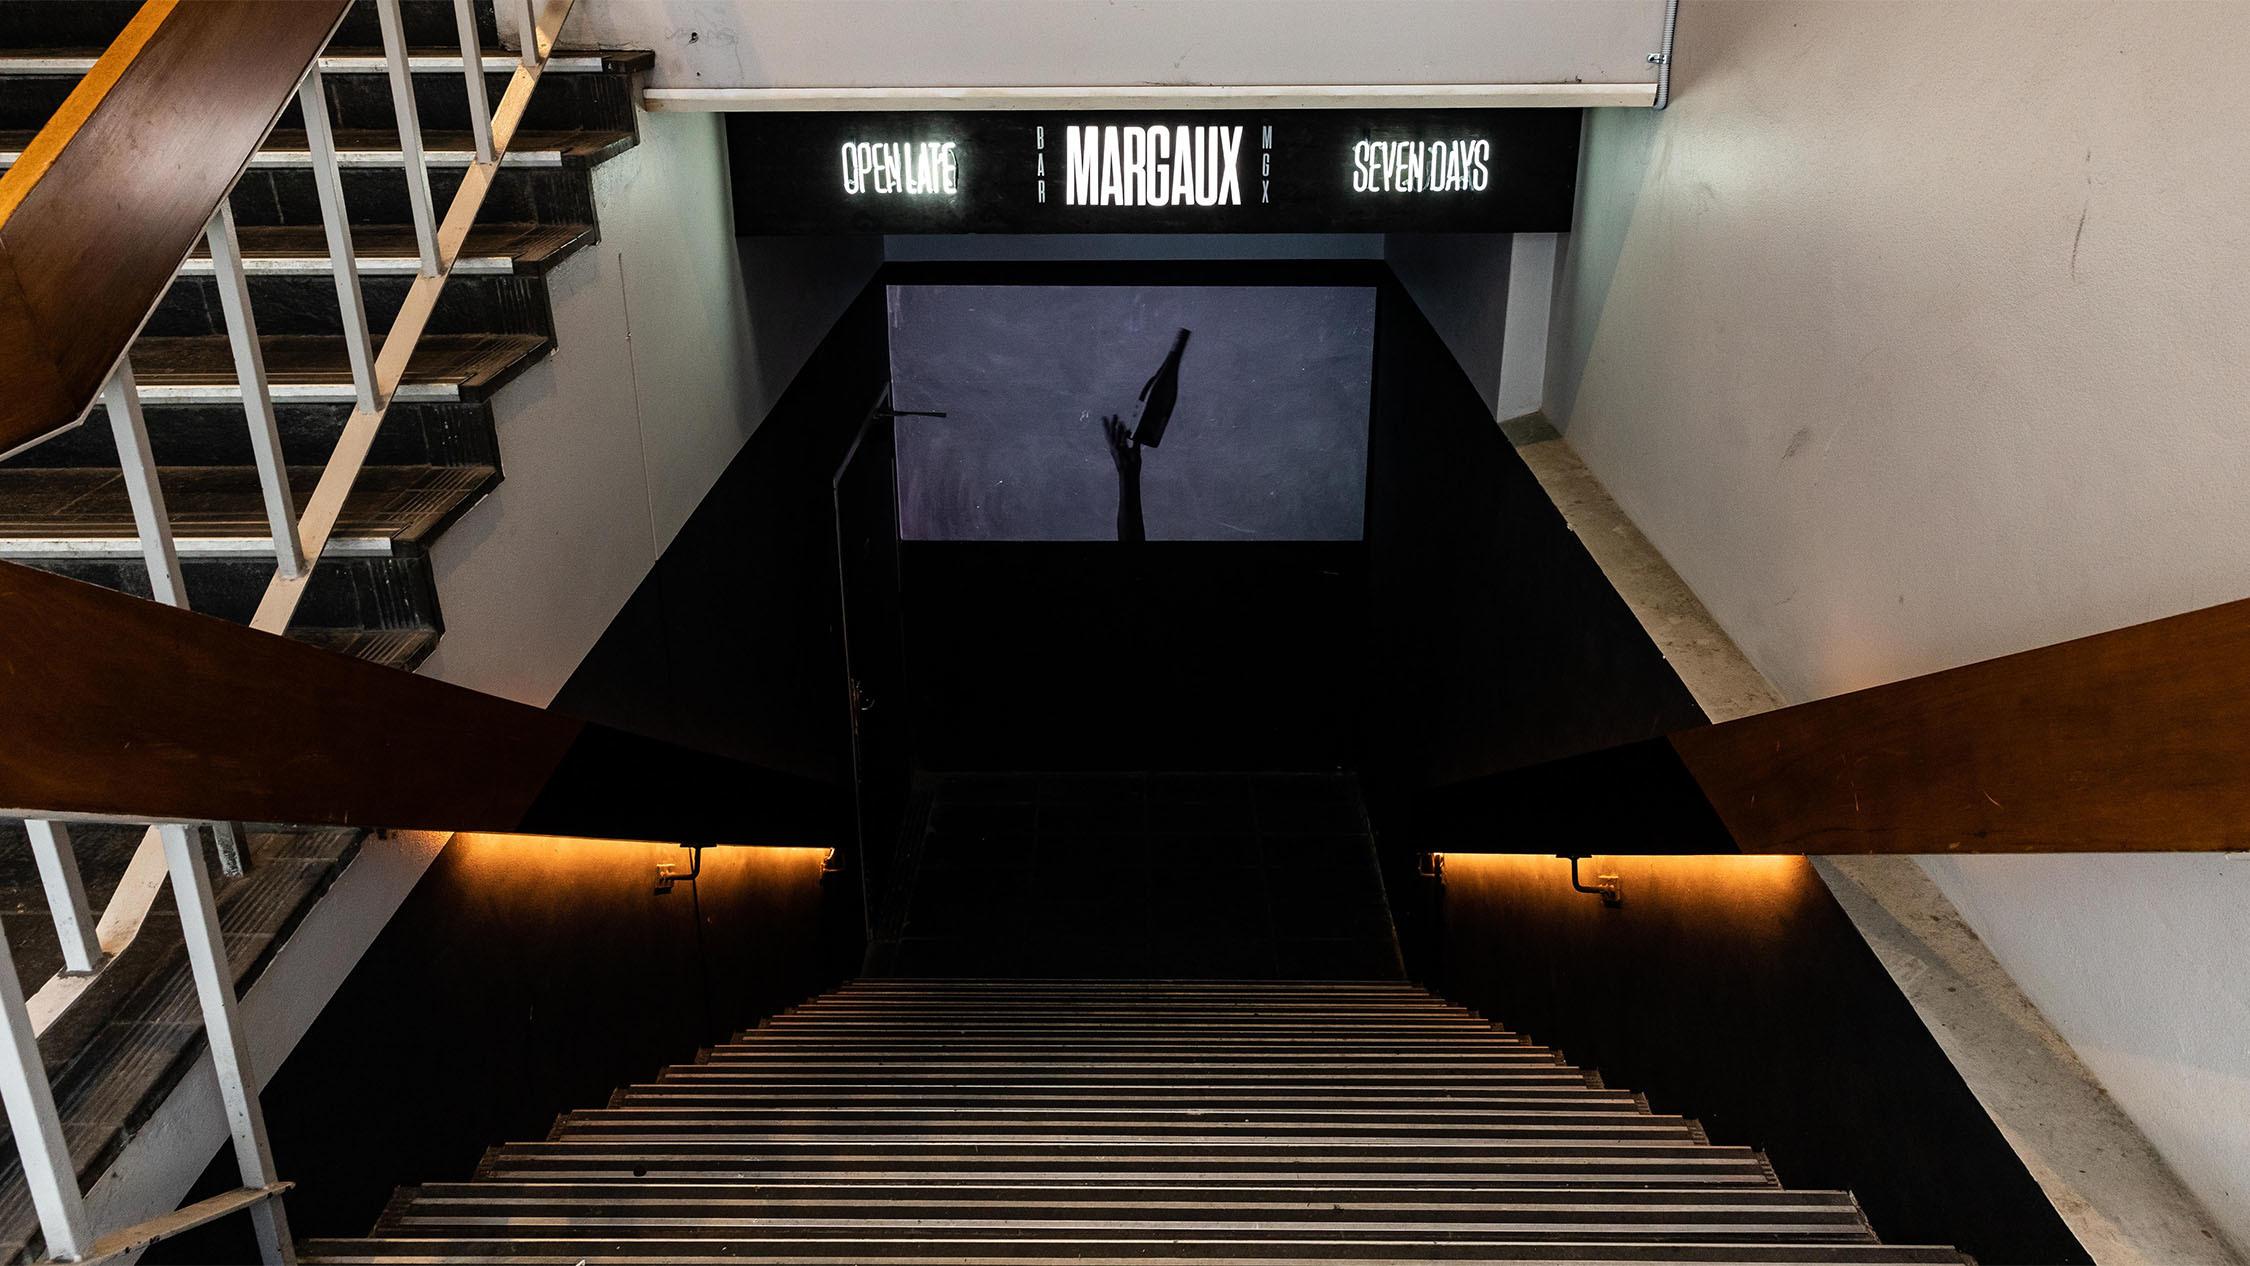 Stairwell at Bar Margaux